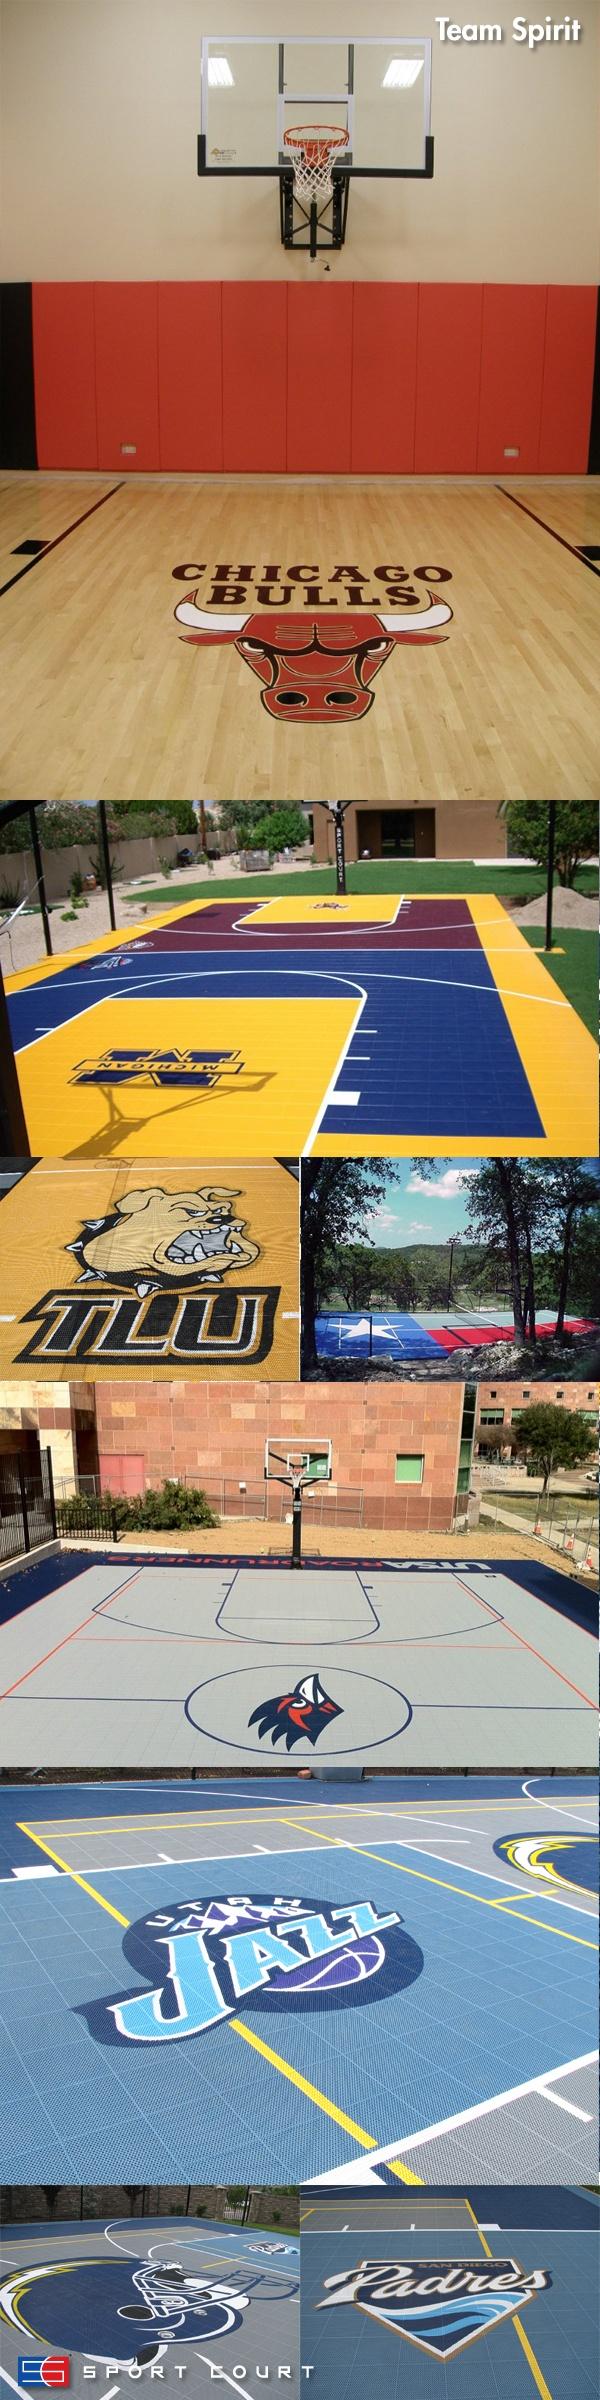 37 best sport court backyard courts images on pinterest backyard